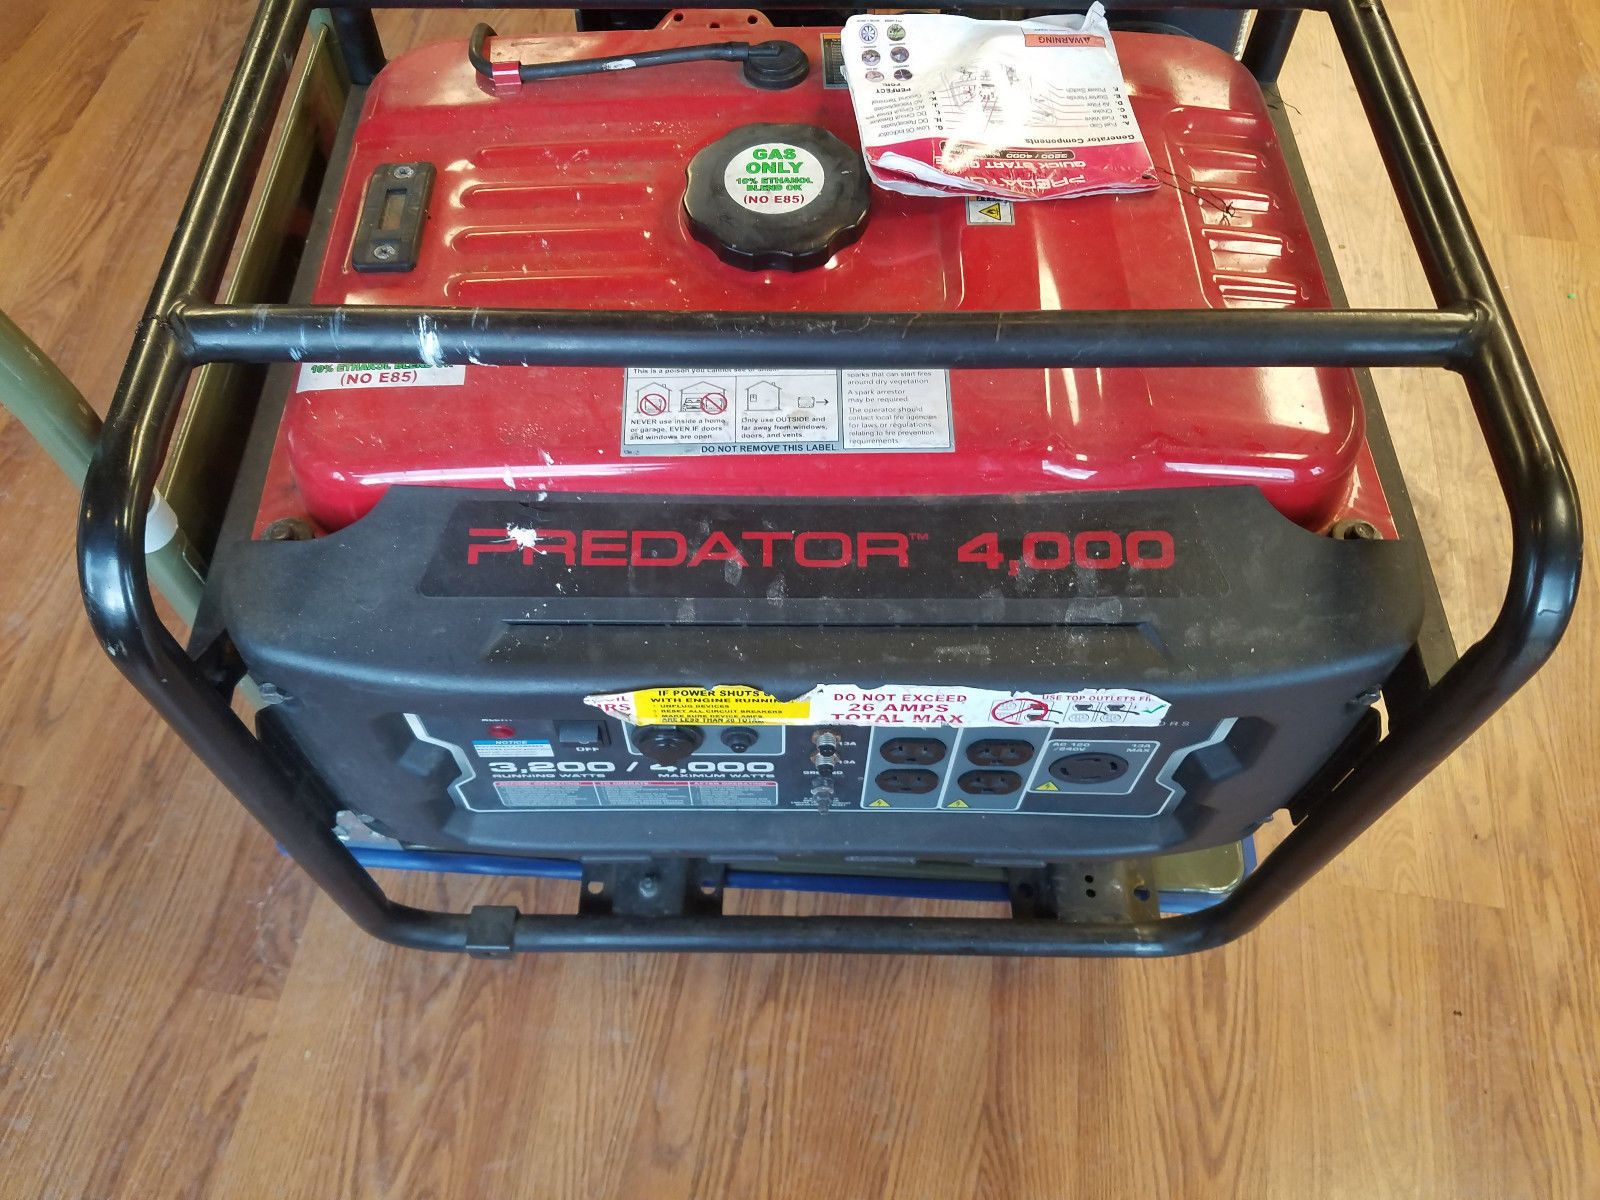 Gas Generator Portable Emergency Predator 4000 Watts Peak 6 5 HP